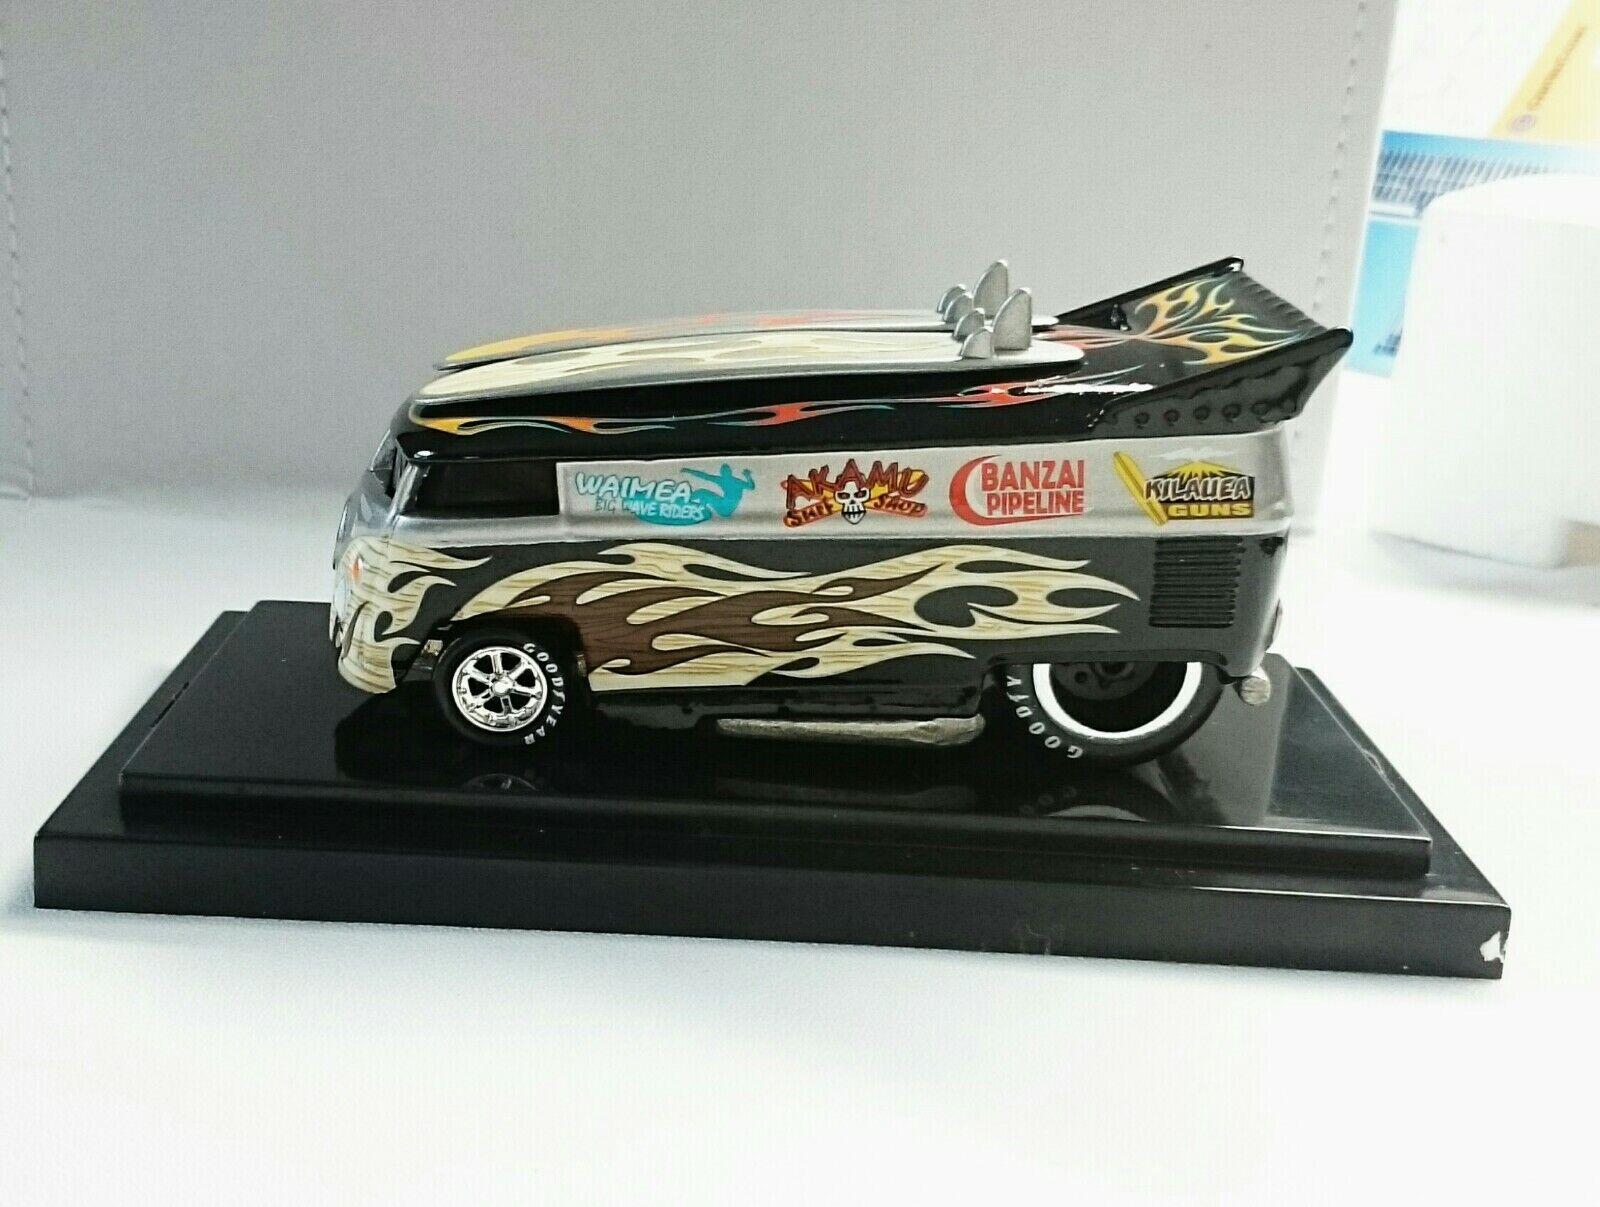 VW DRAG BUS FIRE boisIE SURFIN SERIES  3  900 1300 VOLKSWAGEN HOT Wtalons LIBERTY  belle